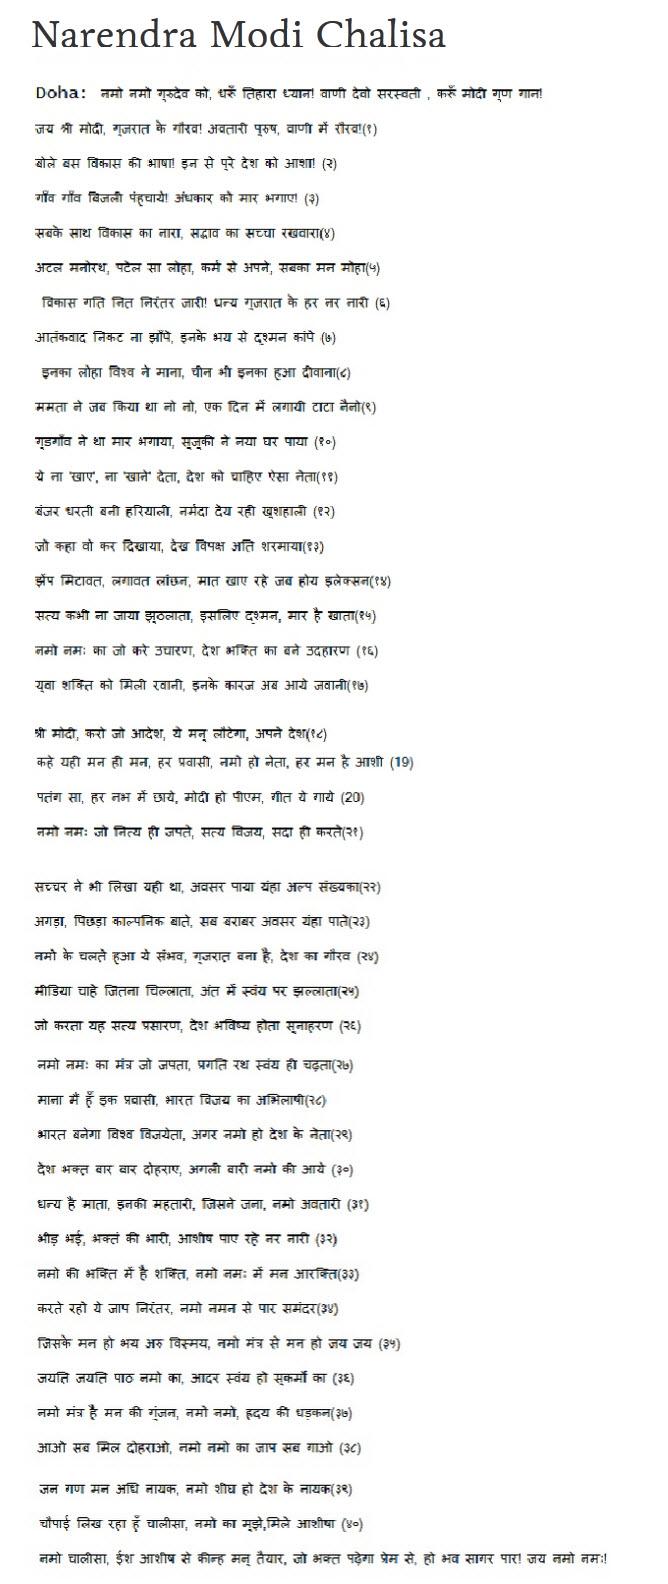 Modi chalisa full in hindi